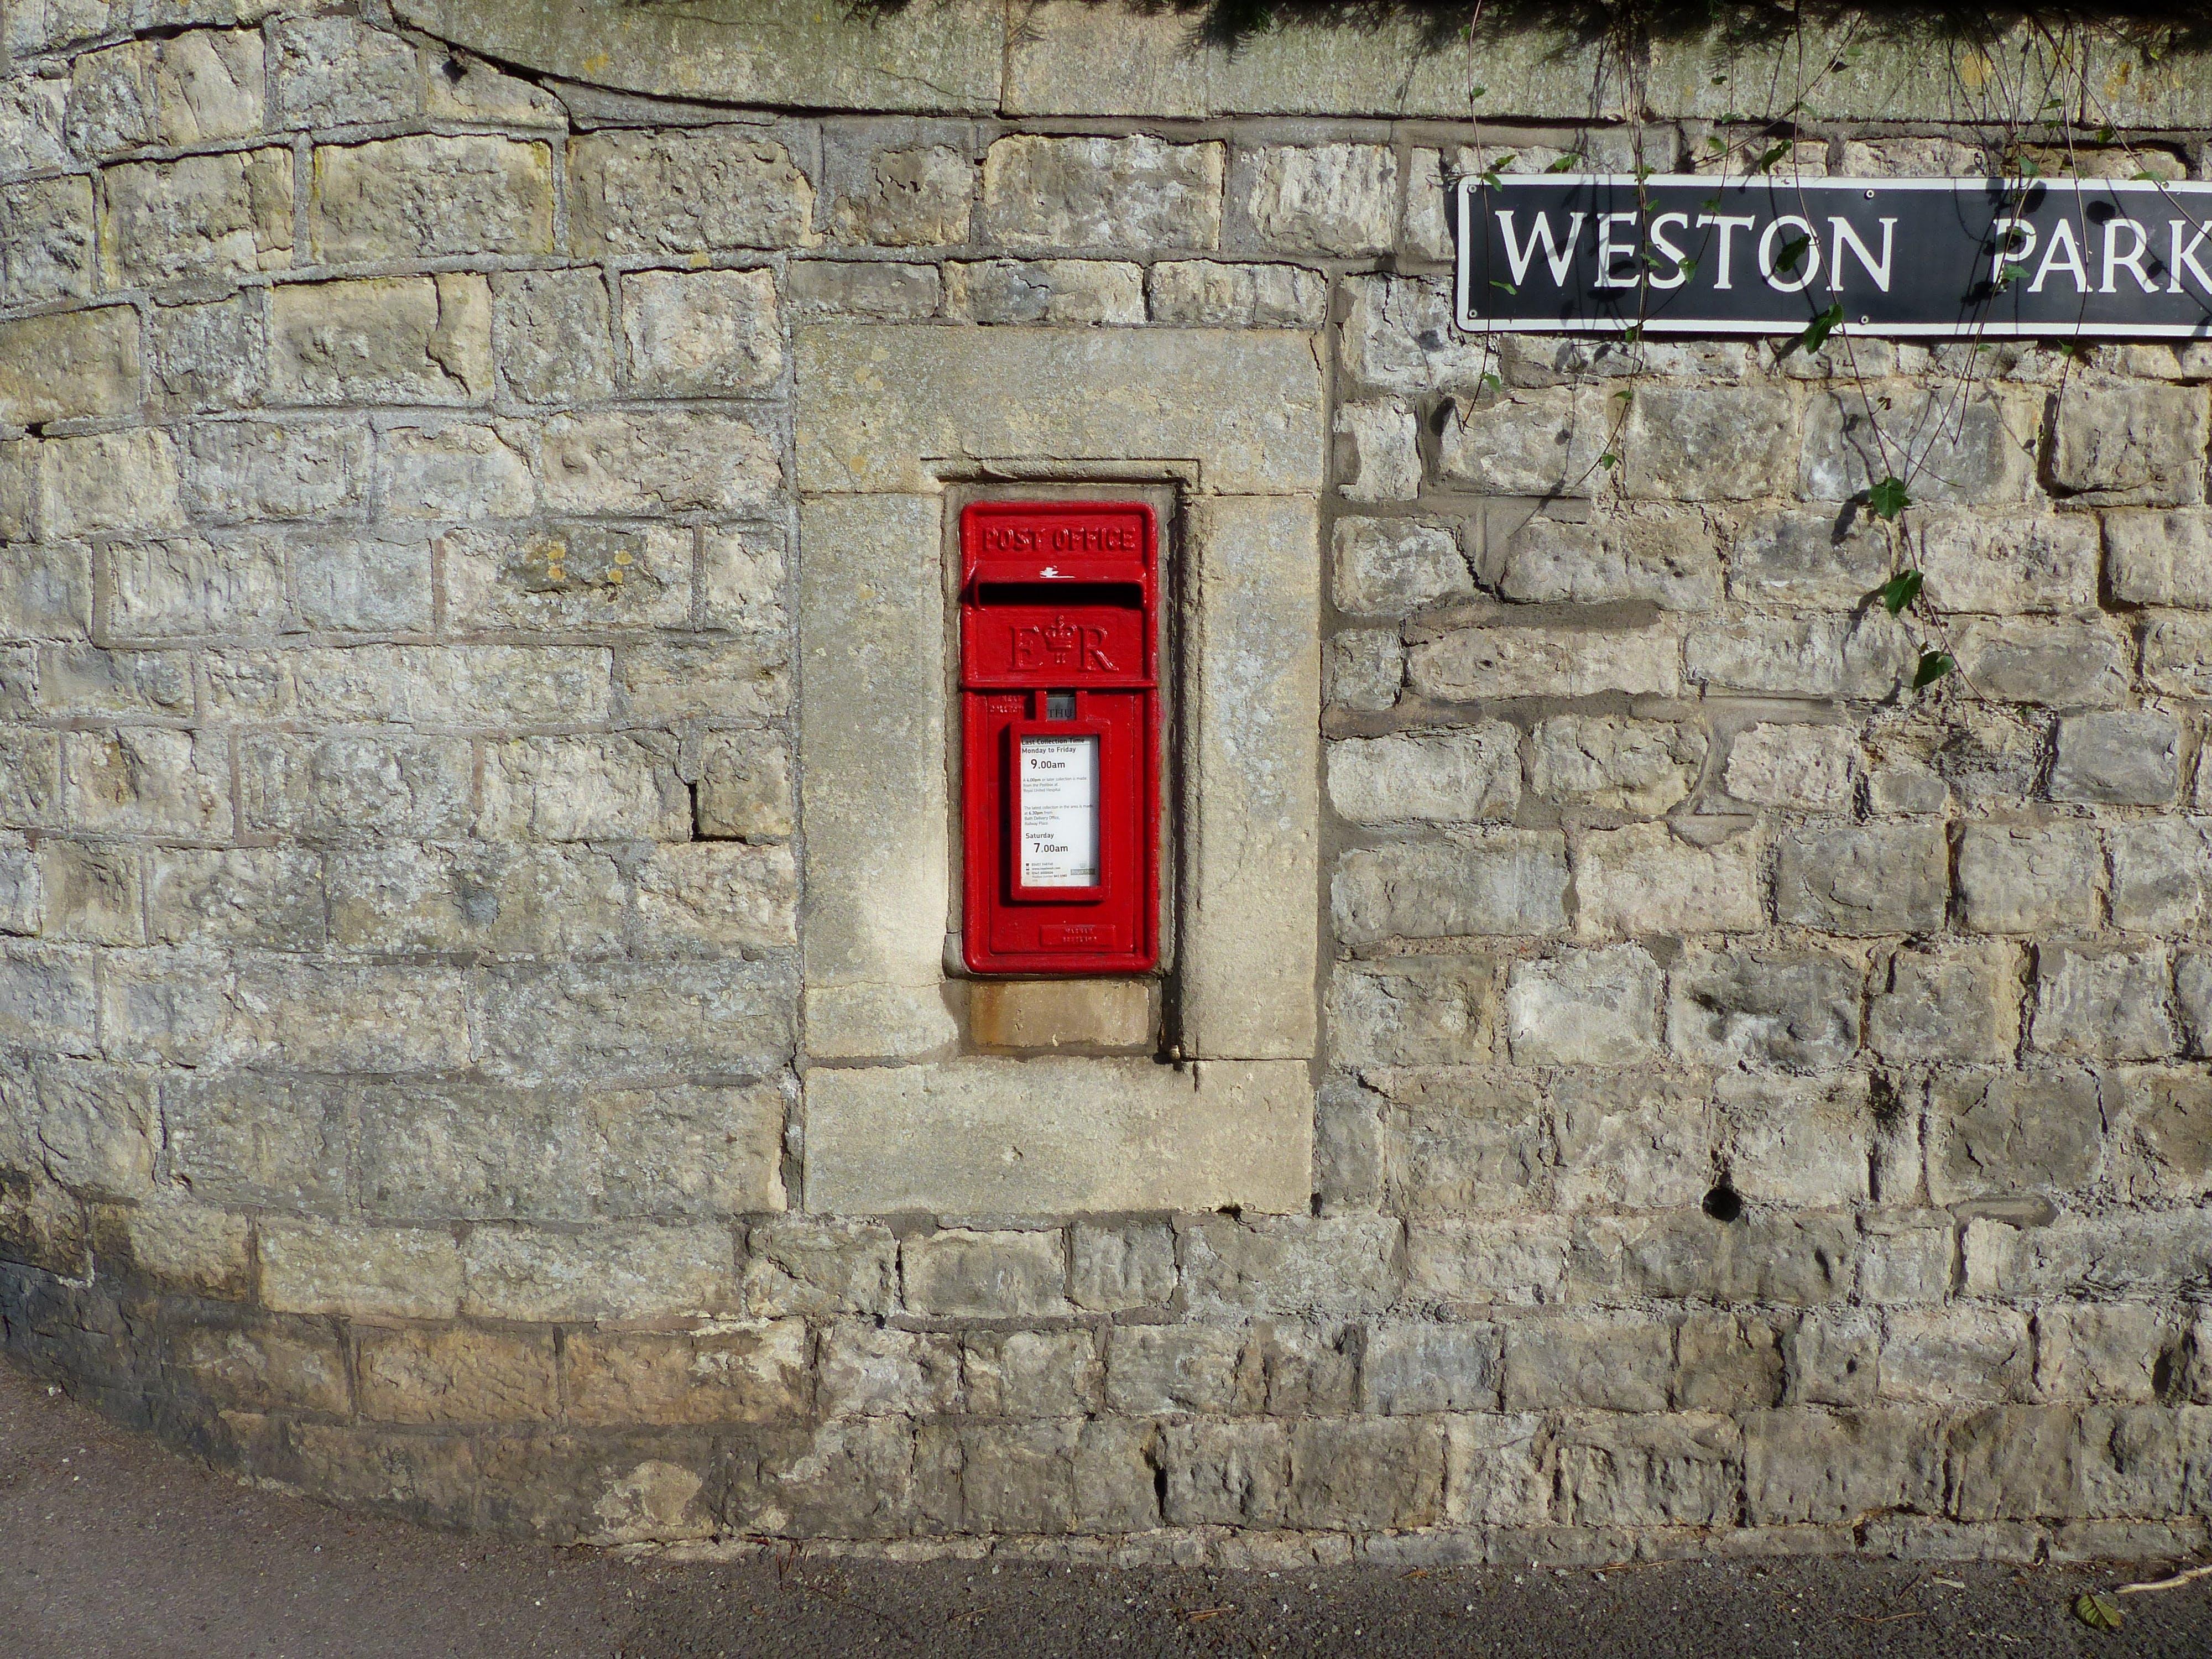 Weston Park Wall